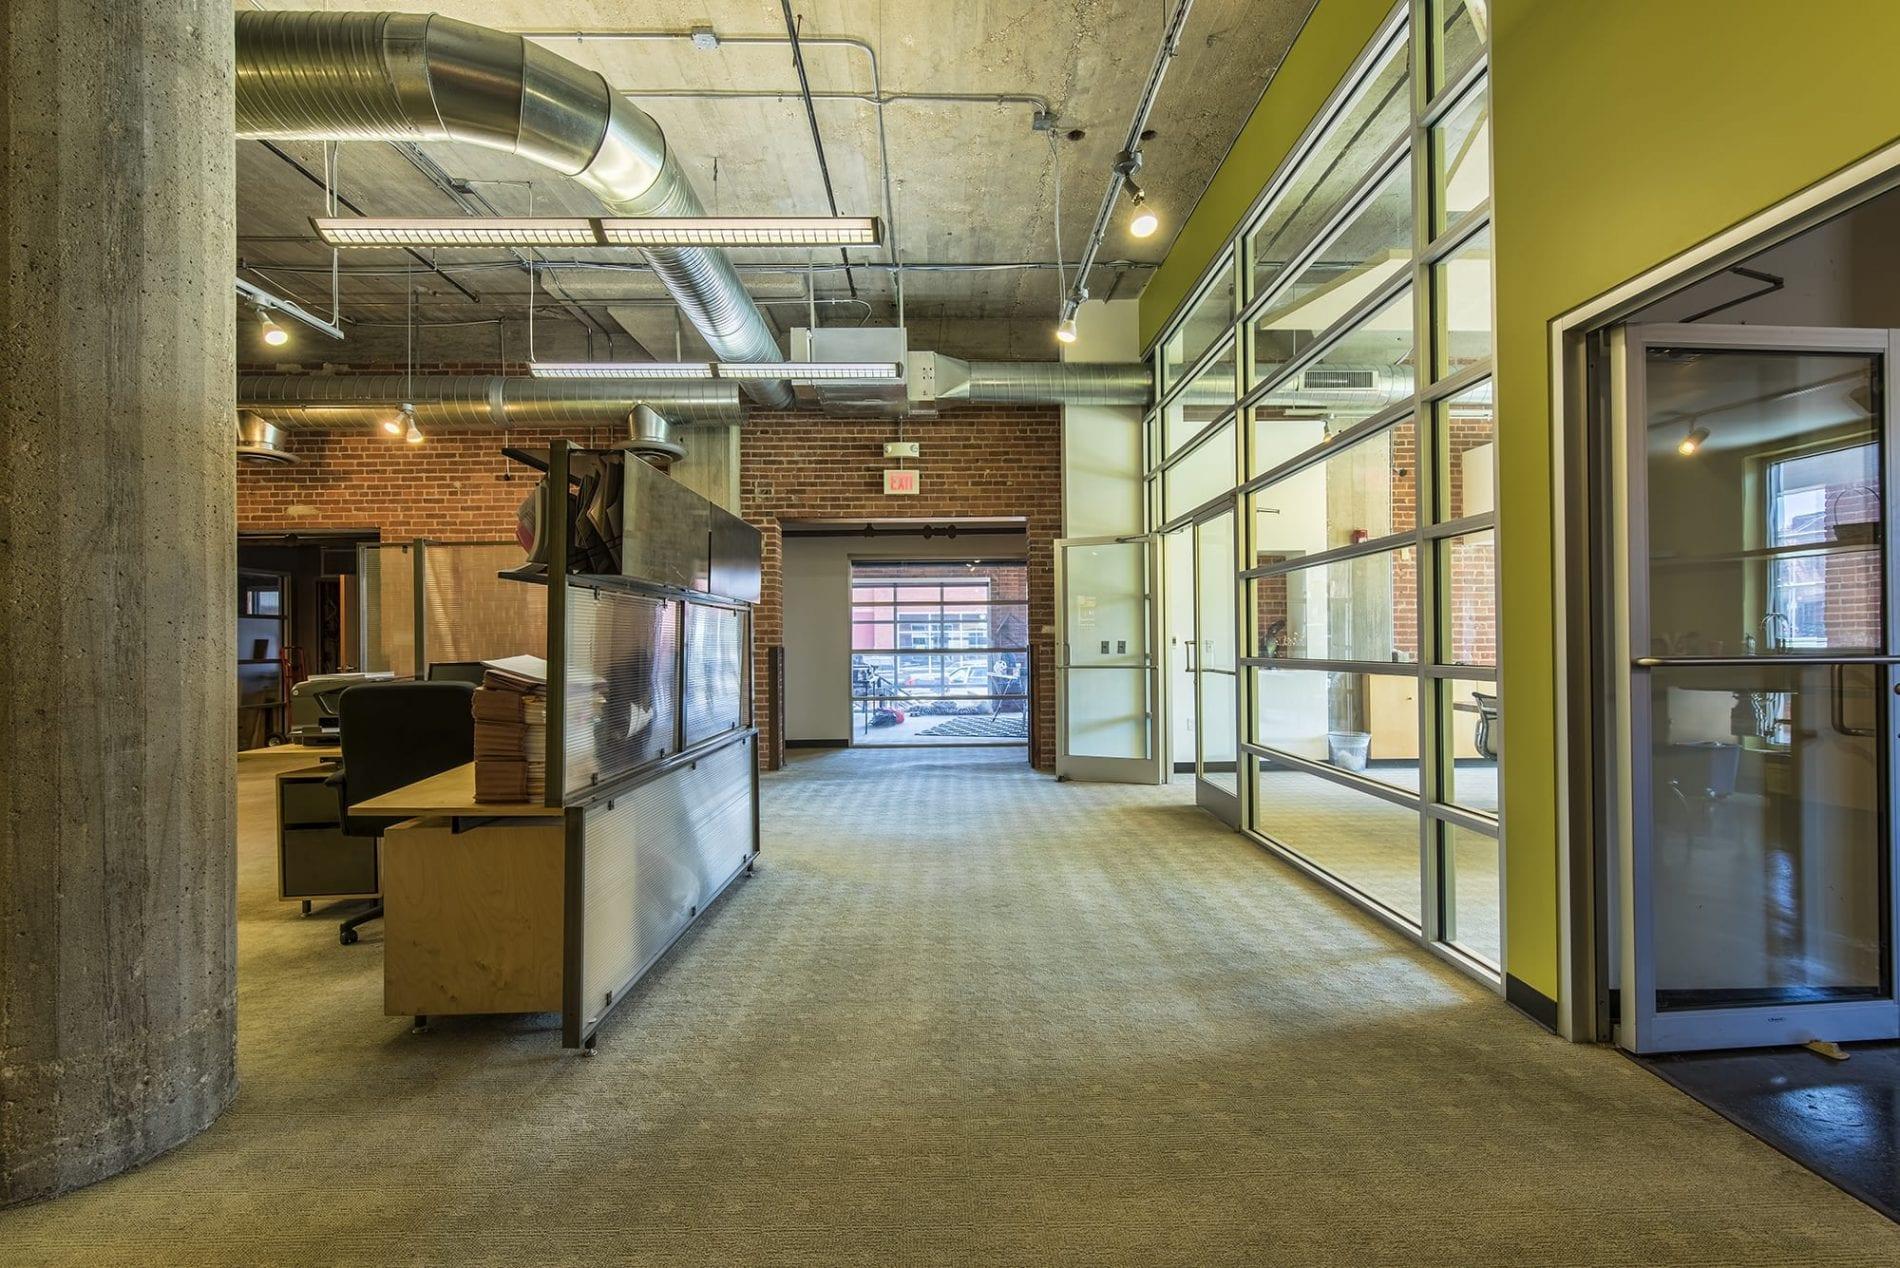 First Floor Office Space Crossroads Arts District Kansas